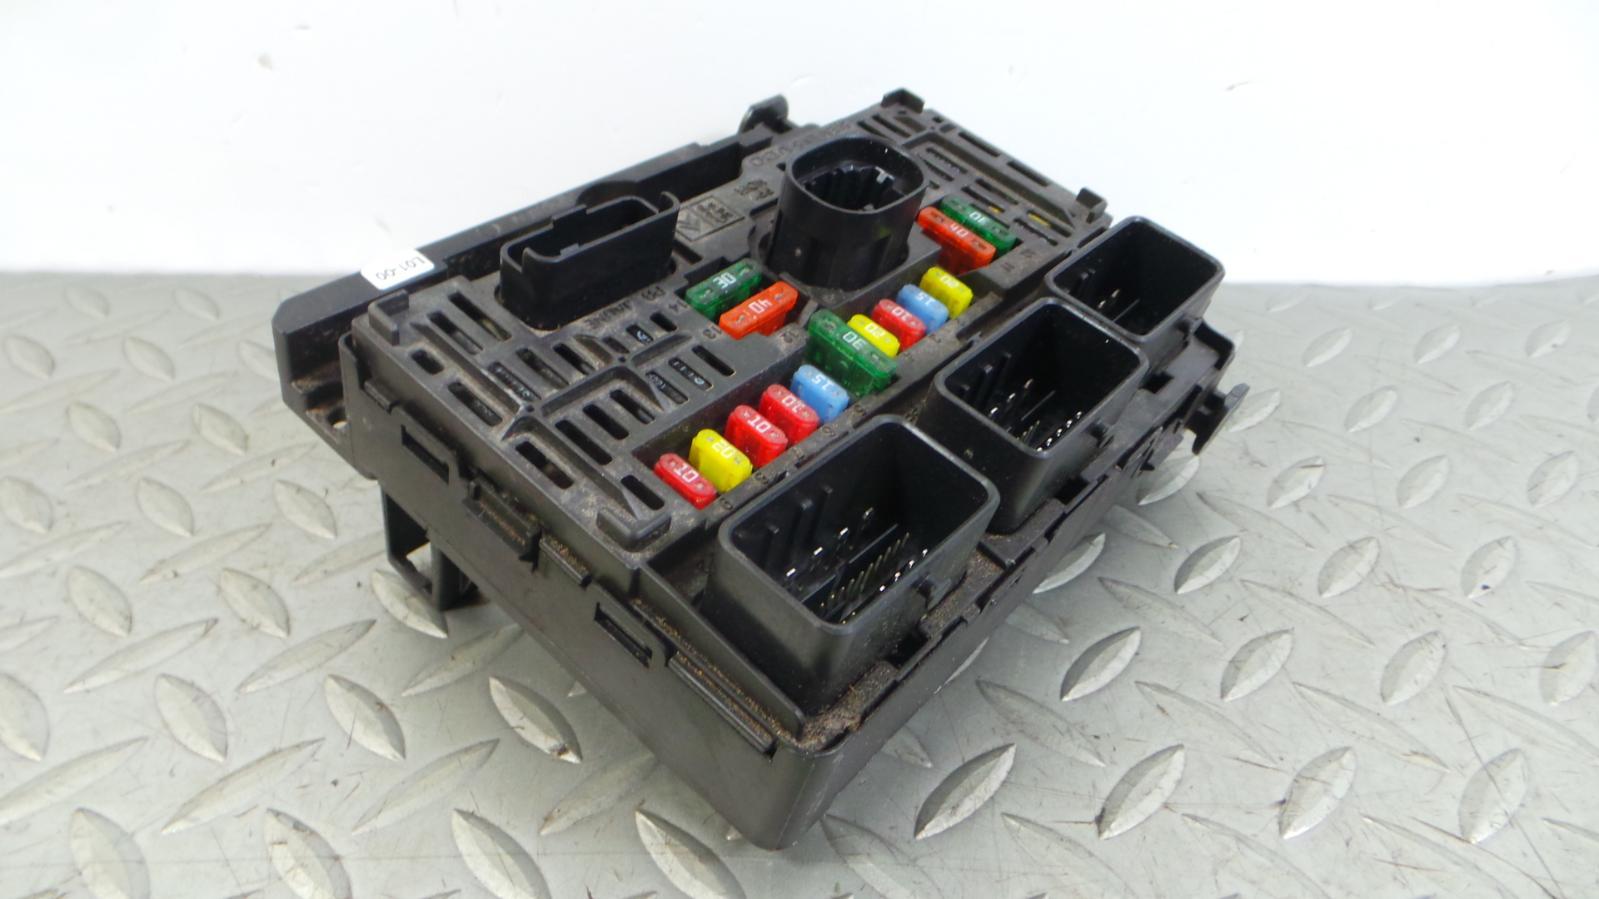 2005 PEUGEOT 407 2 0 Petrol ECU + BSI Kit Lock Set IAW 6LP1 54 058